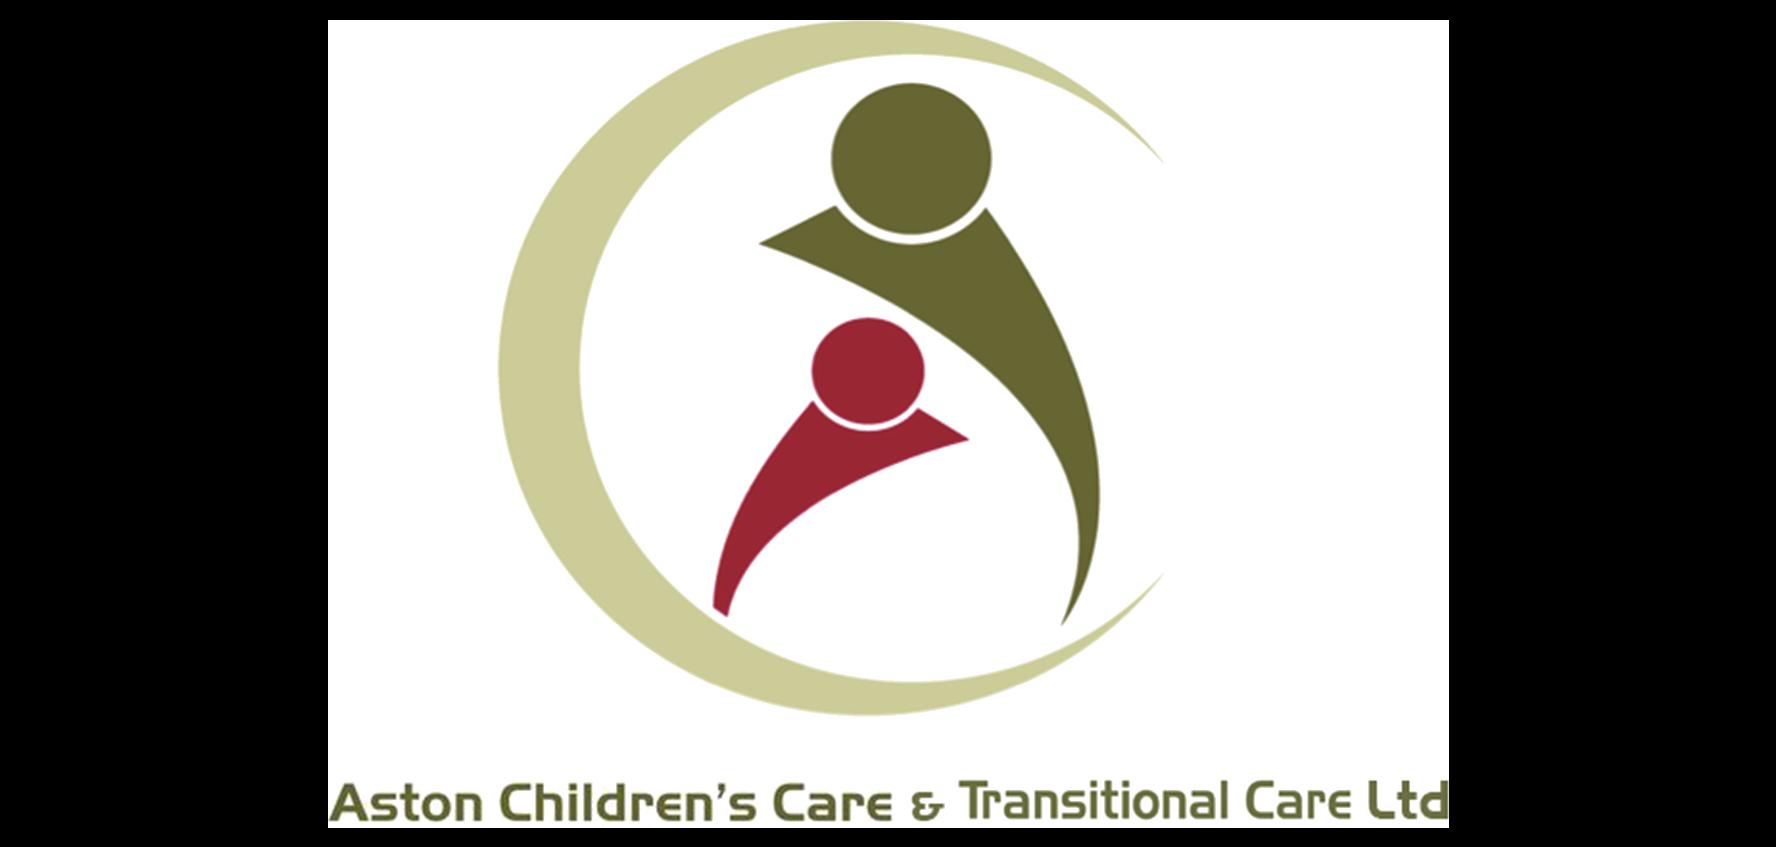 Aston_Childrens_Care